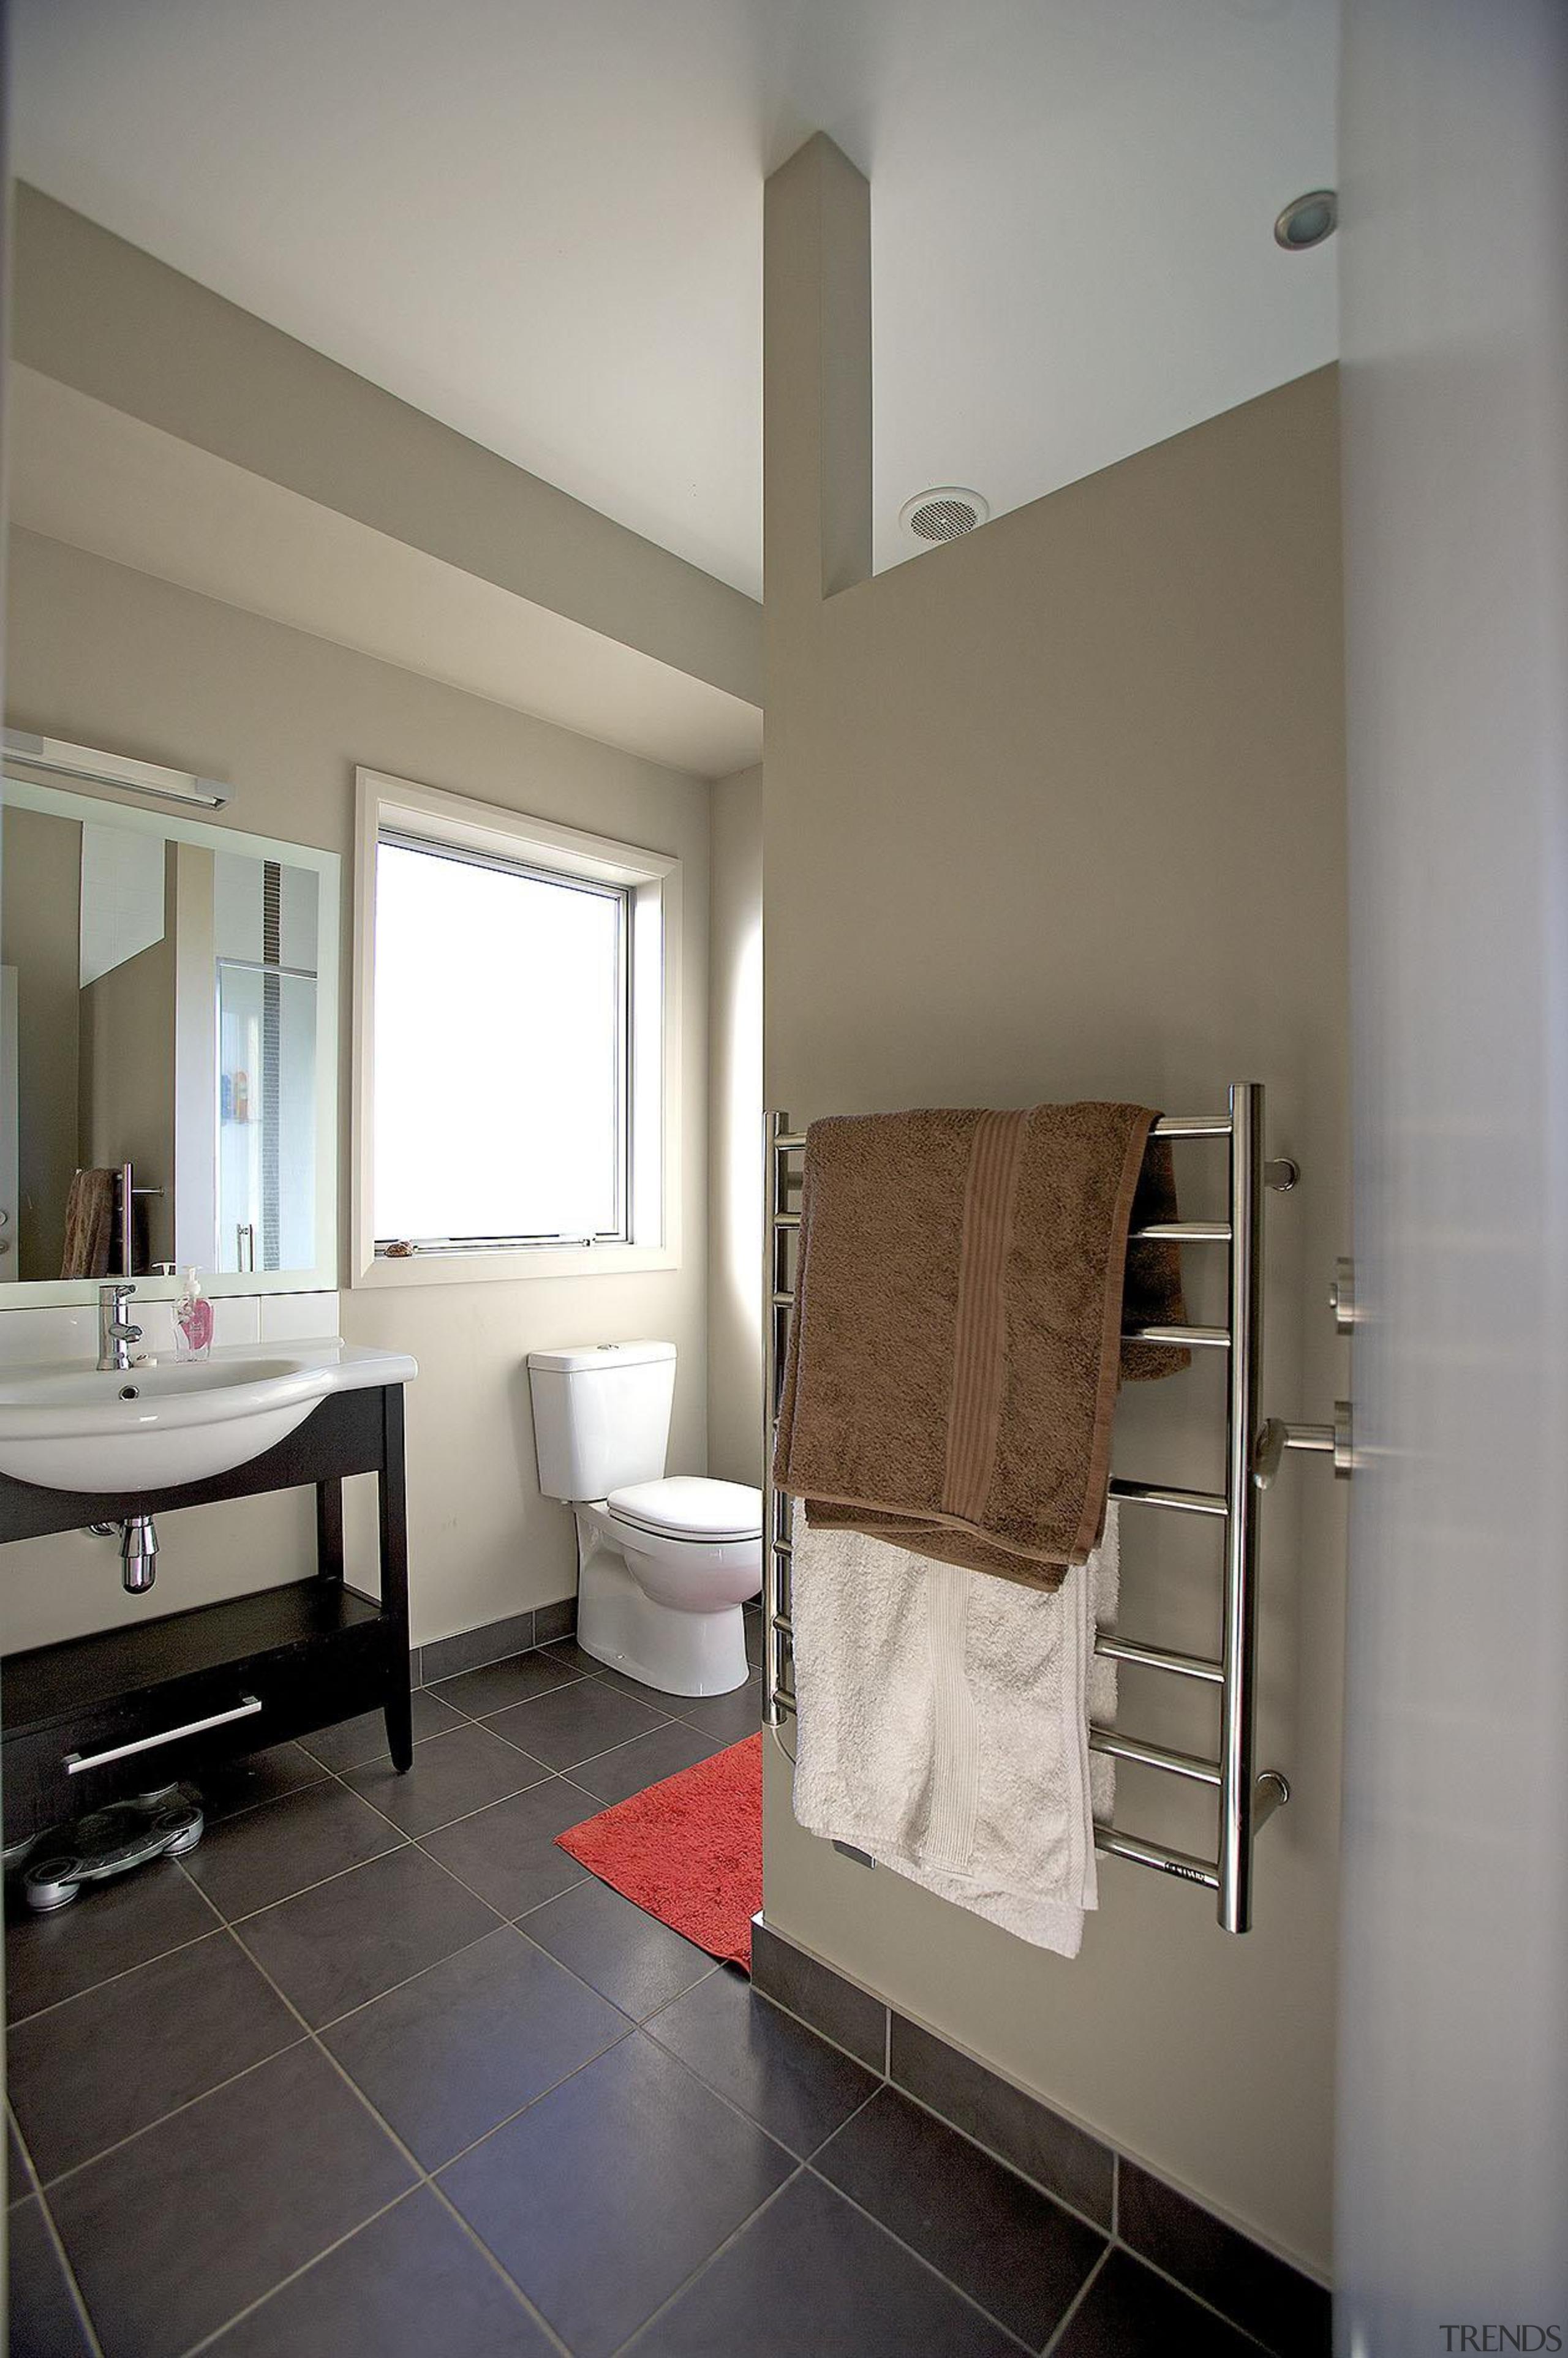 For more information, please visit www.gjgardner.co.nz architecture, bathroom, ceiling, daylighting, floor, flooring, home, interior design, living room, real estate, room, window, gray